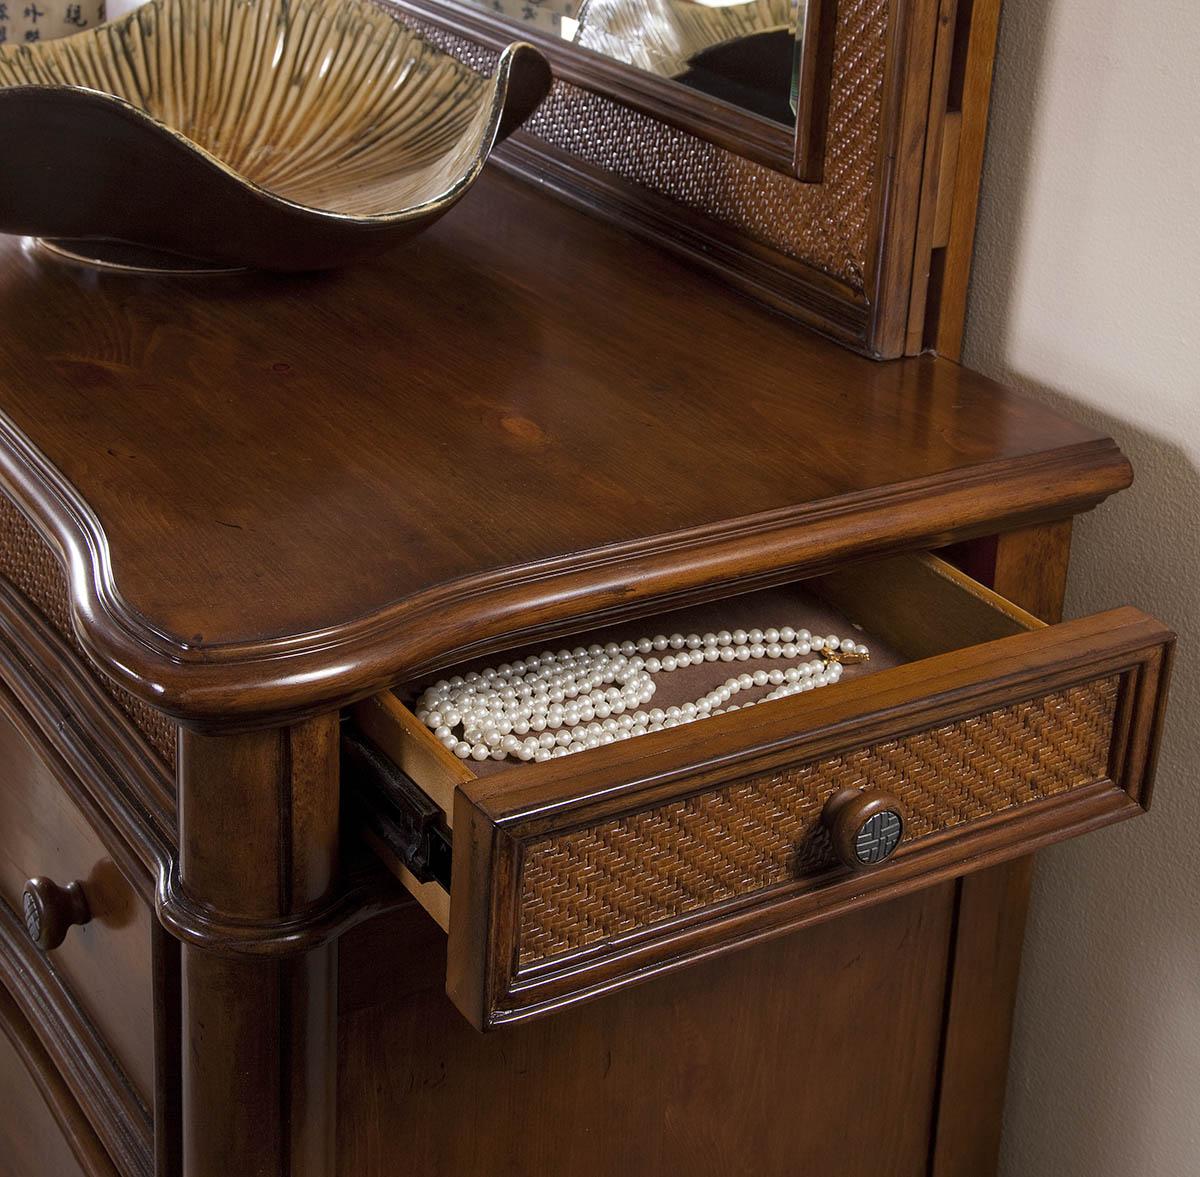 6000-280 Dresser_mirror _Side drawer-web.jpg